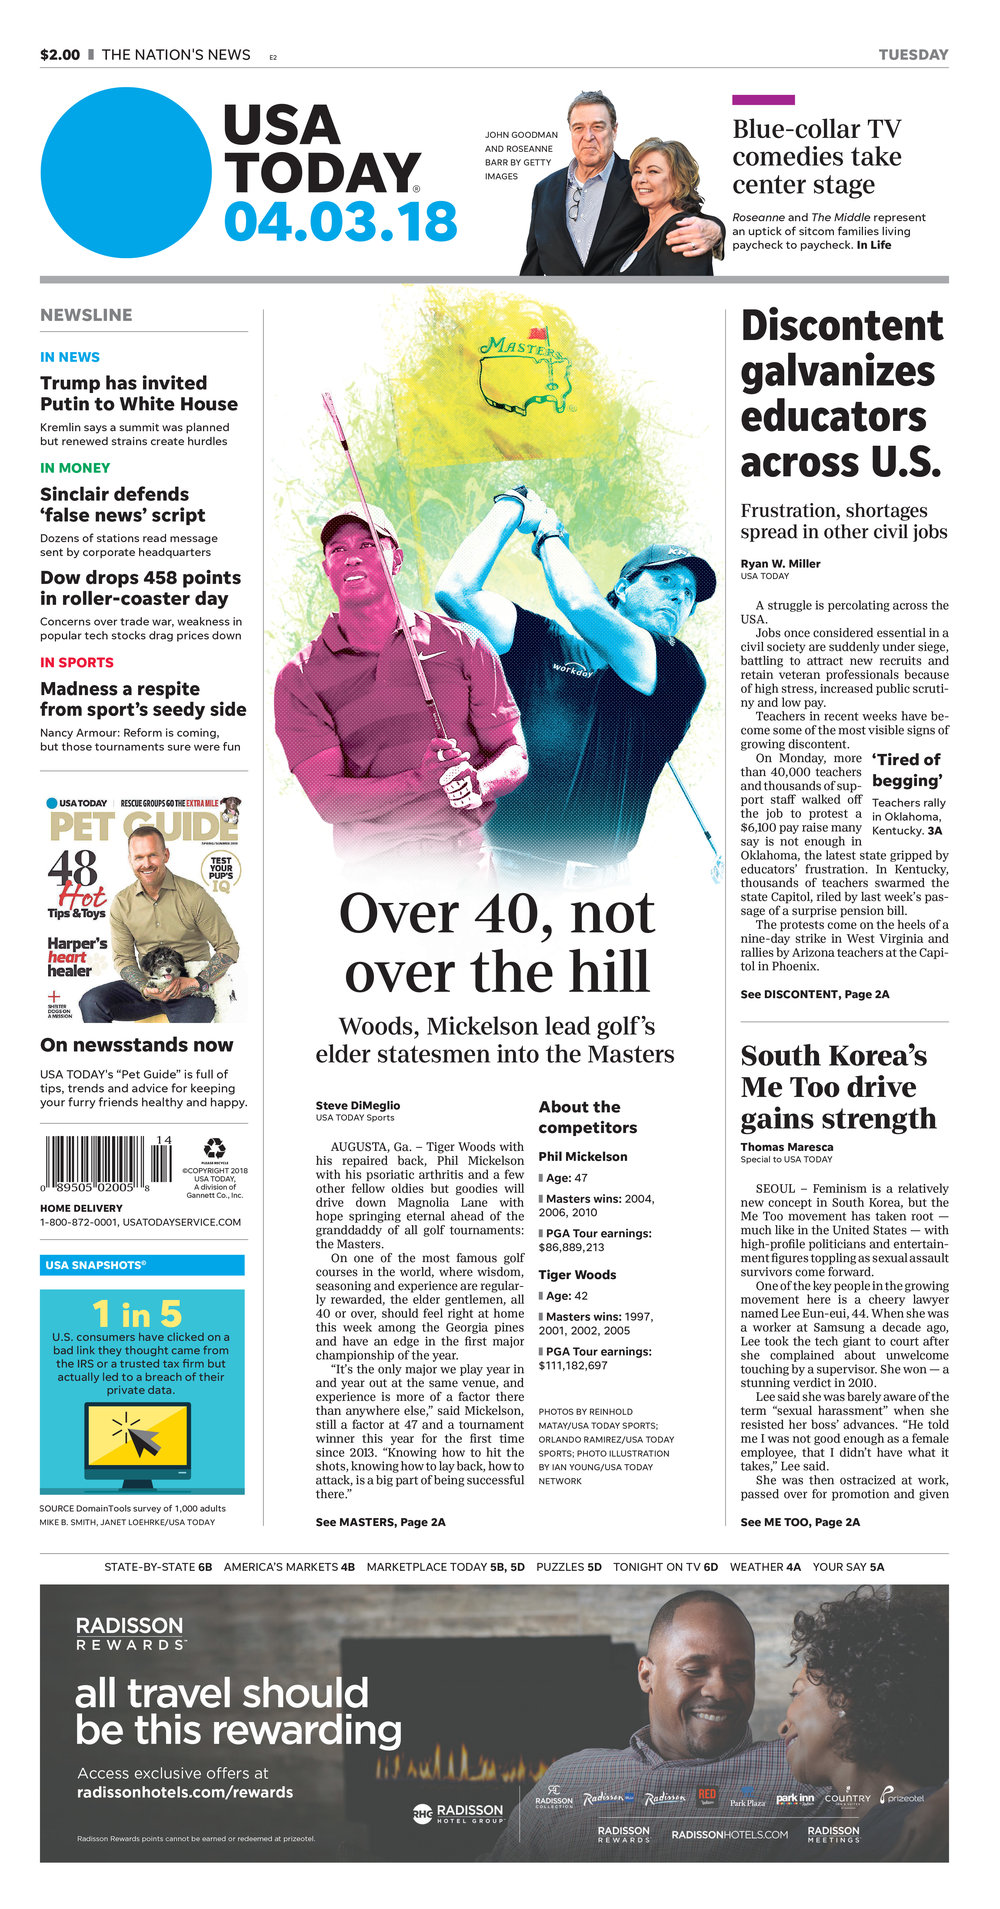 A1, USA1Brd 04-03-2018, USAEast 2 - News.jpg